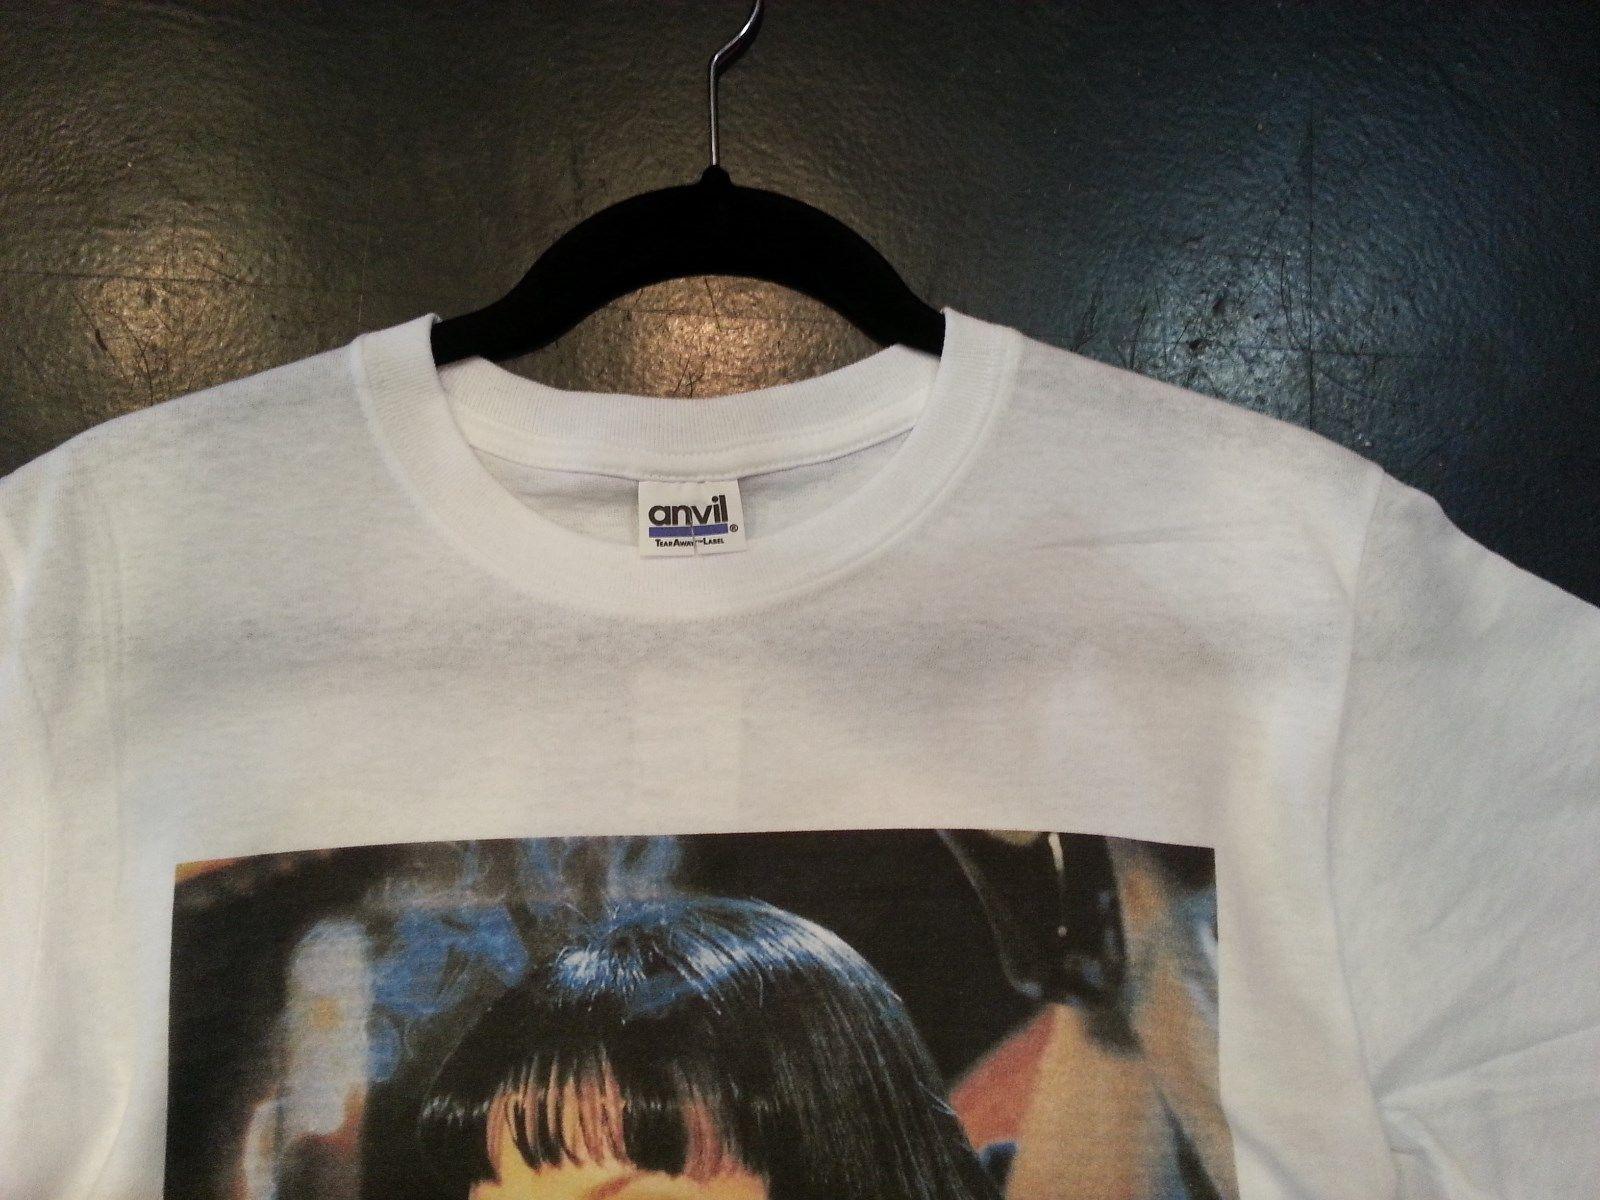 Uma Thurman Pulp Fiction T shirt Mia Wallace Small, Medium, Large, Xlarge image 3